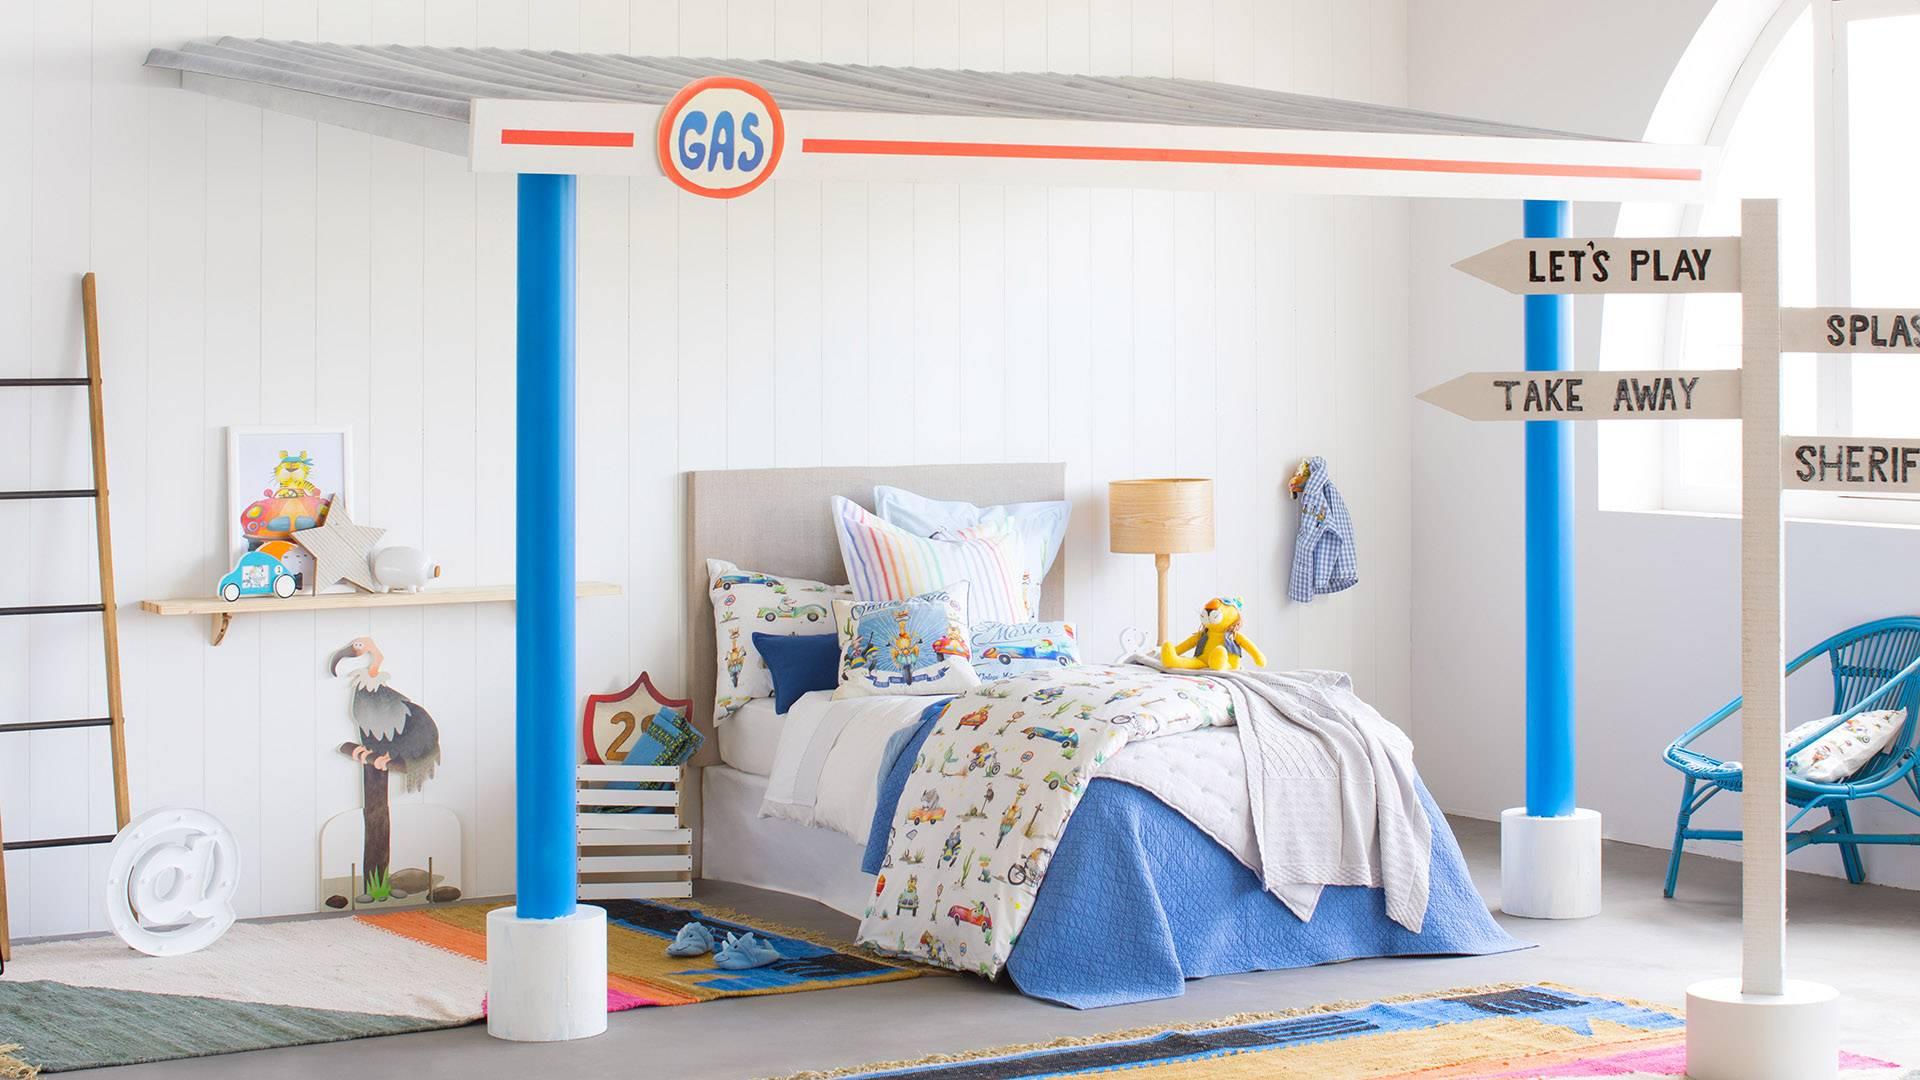 zara home den haag best zara home den haag with zara home den haag great in rosa teppiche. Black Bedroom Furniture Sets. Home Design Ideas